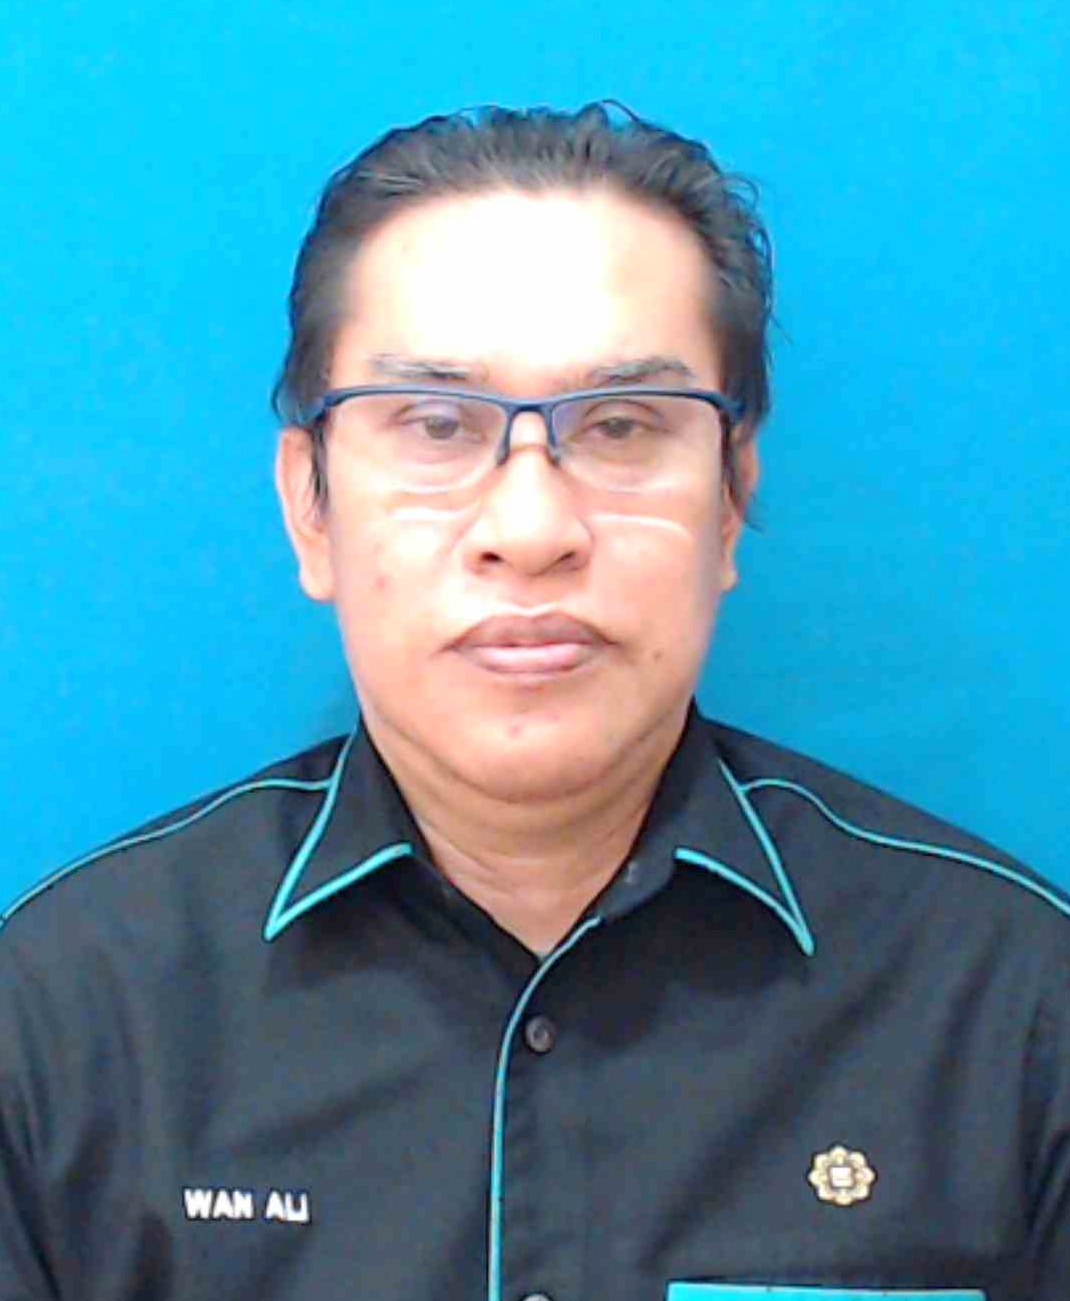 Wan Ali Bin Wan Abdul Razak